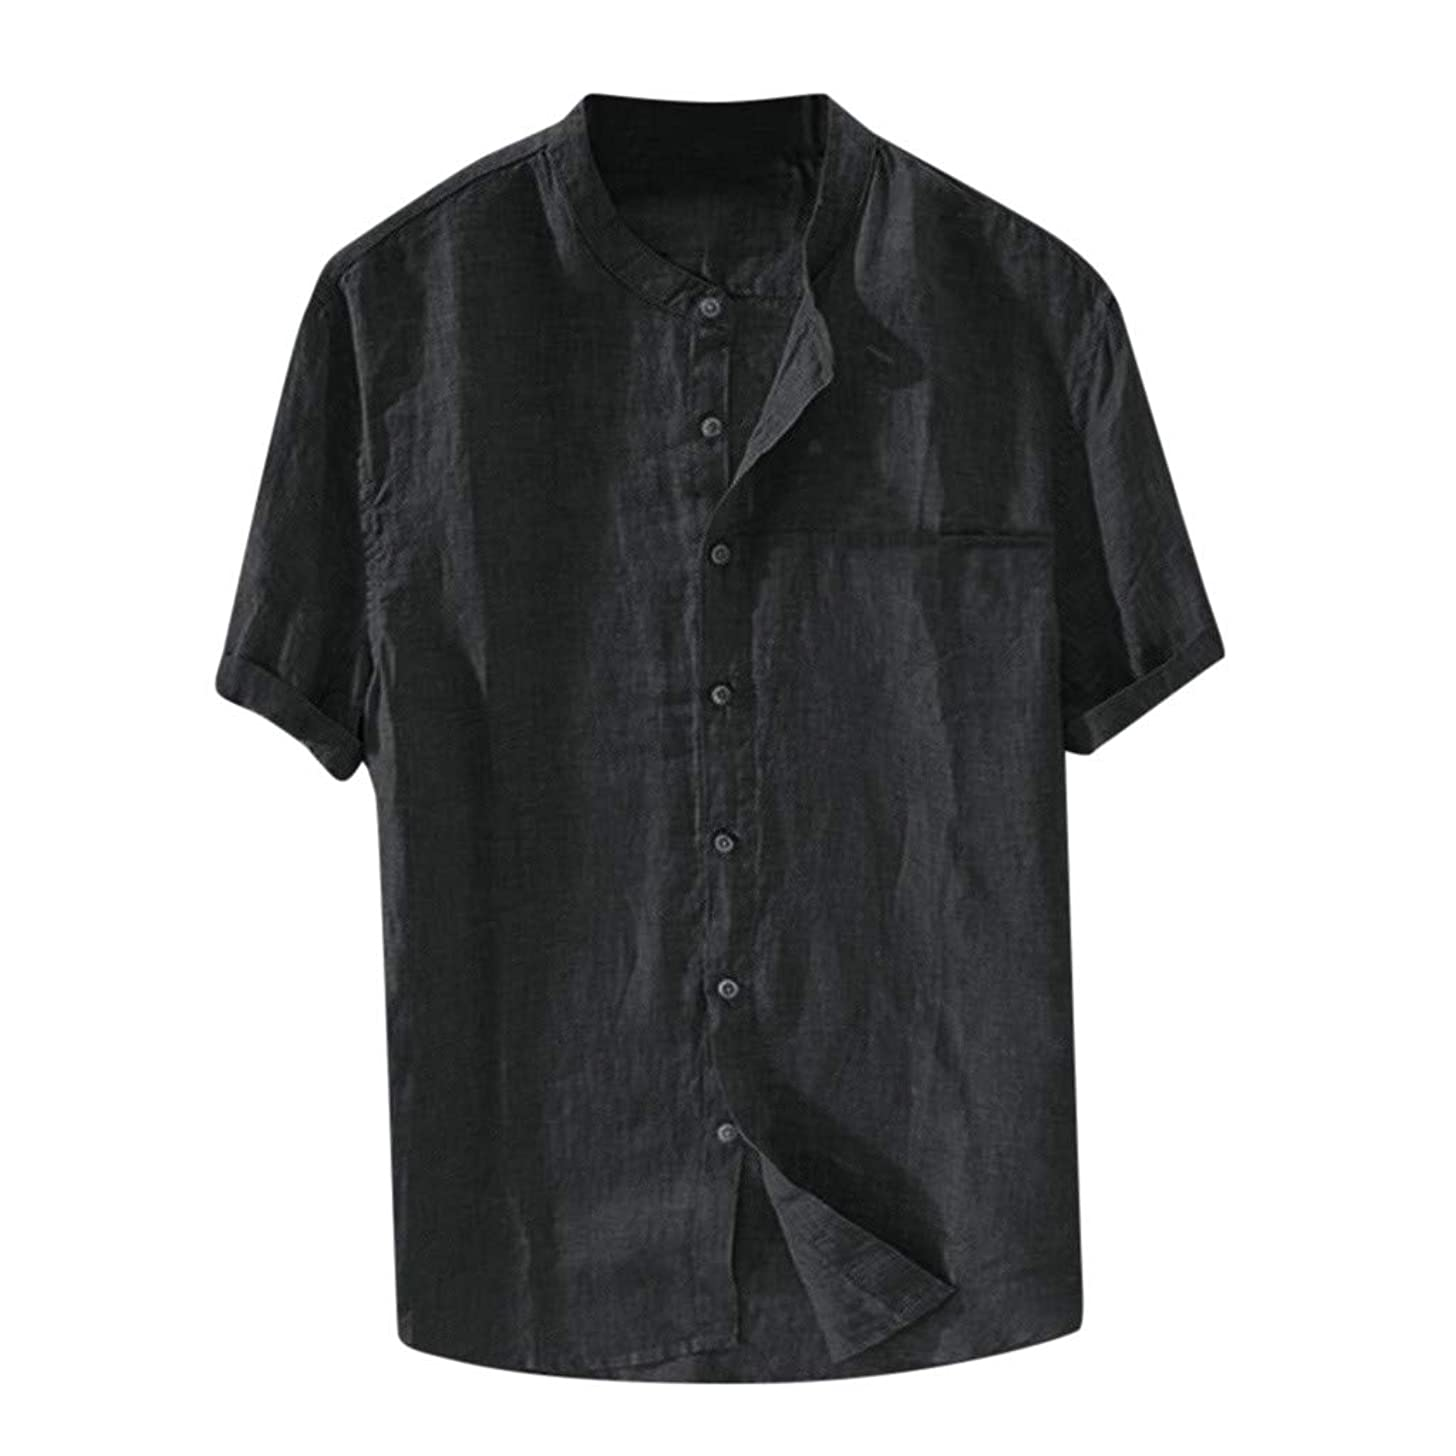 Nuewofally Mens Casual Striped Long Sleeve Shirt Crew Mandarin Collar Henley Shirts Button Up Baggy Cotton Linen Blouse (Black,S)